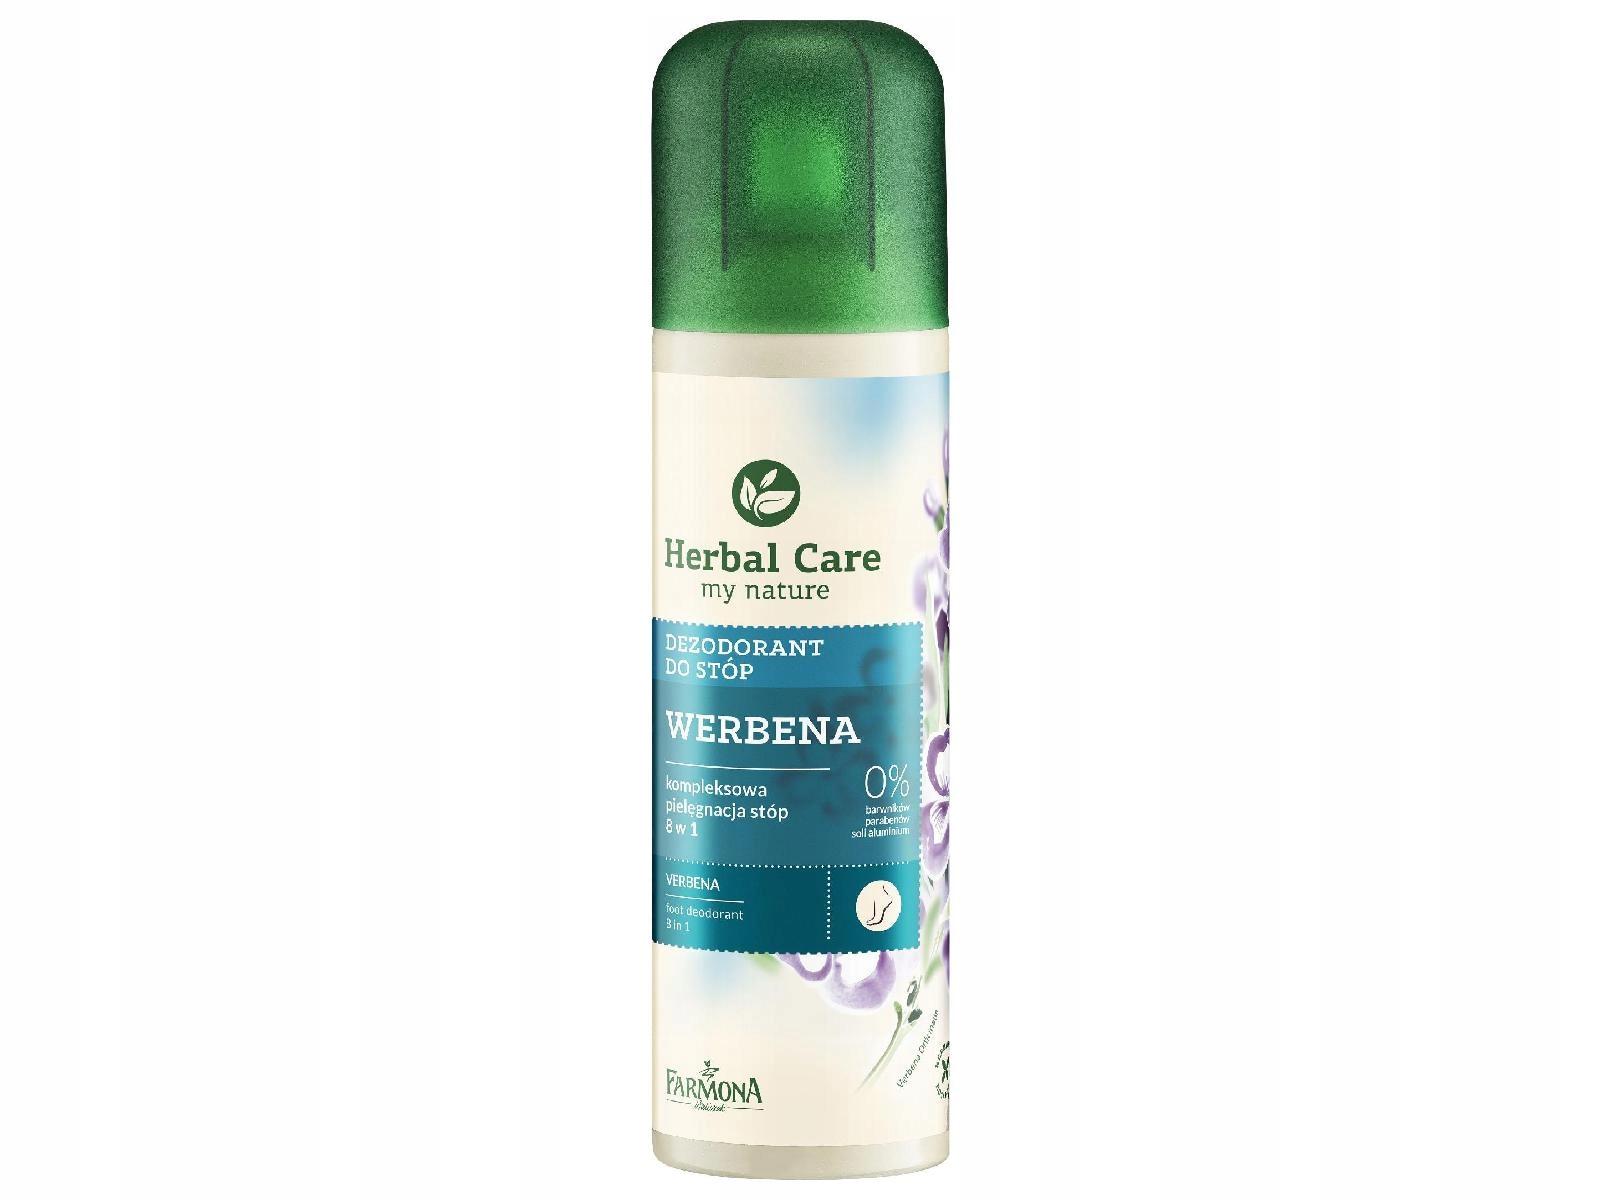 Farmona Herbal Care Dezodorant do stóp 8w1 150ml